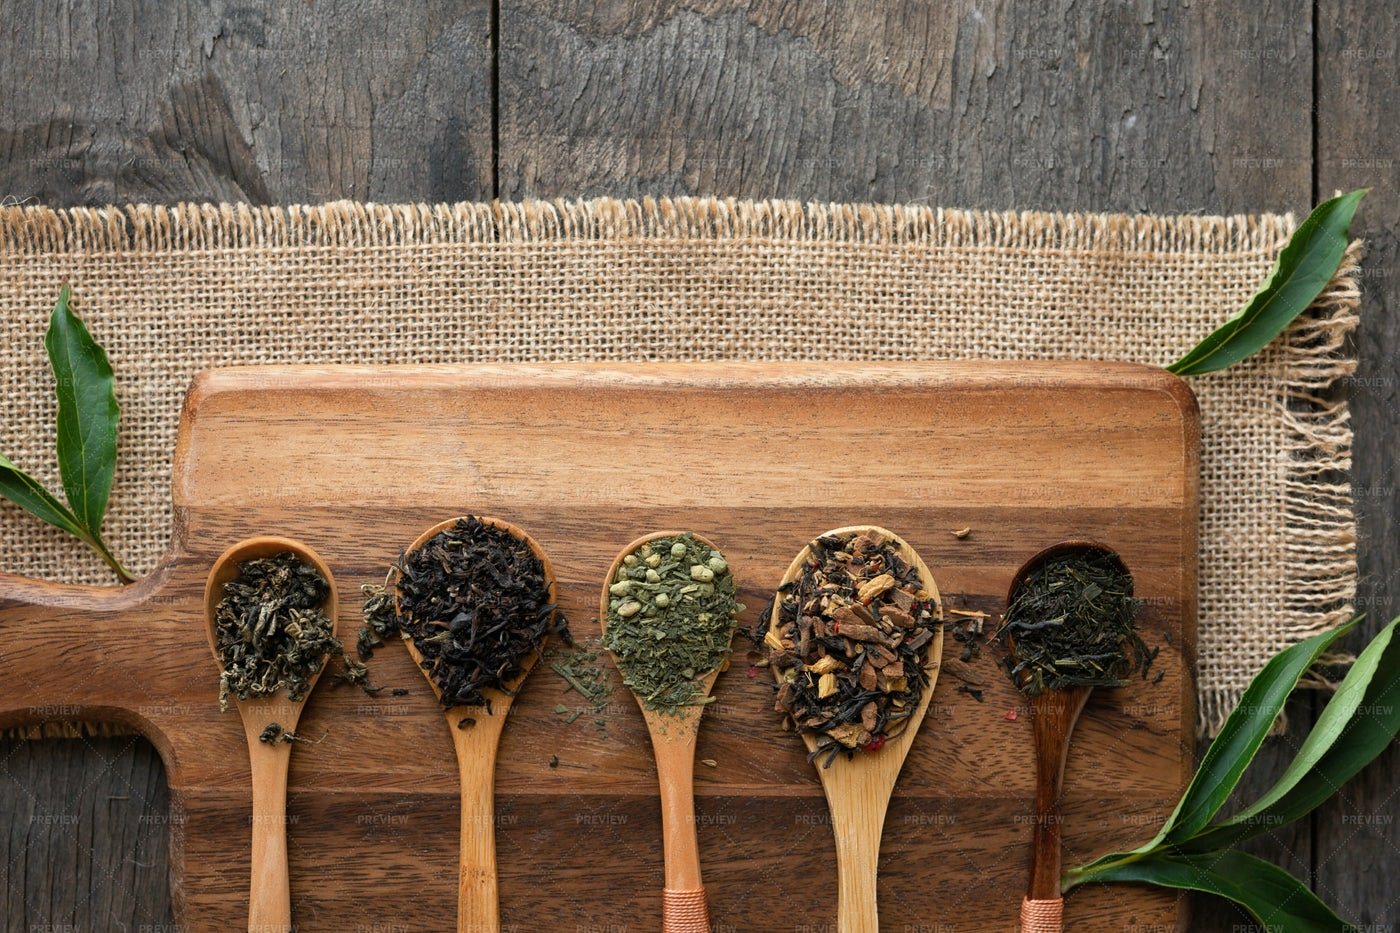 Spoonfuls Of Tea: Stock Photos